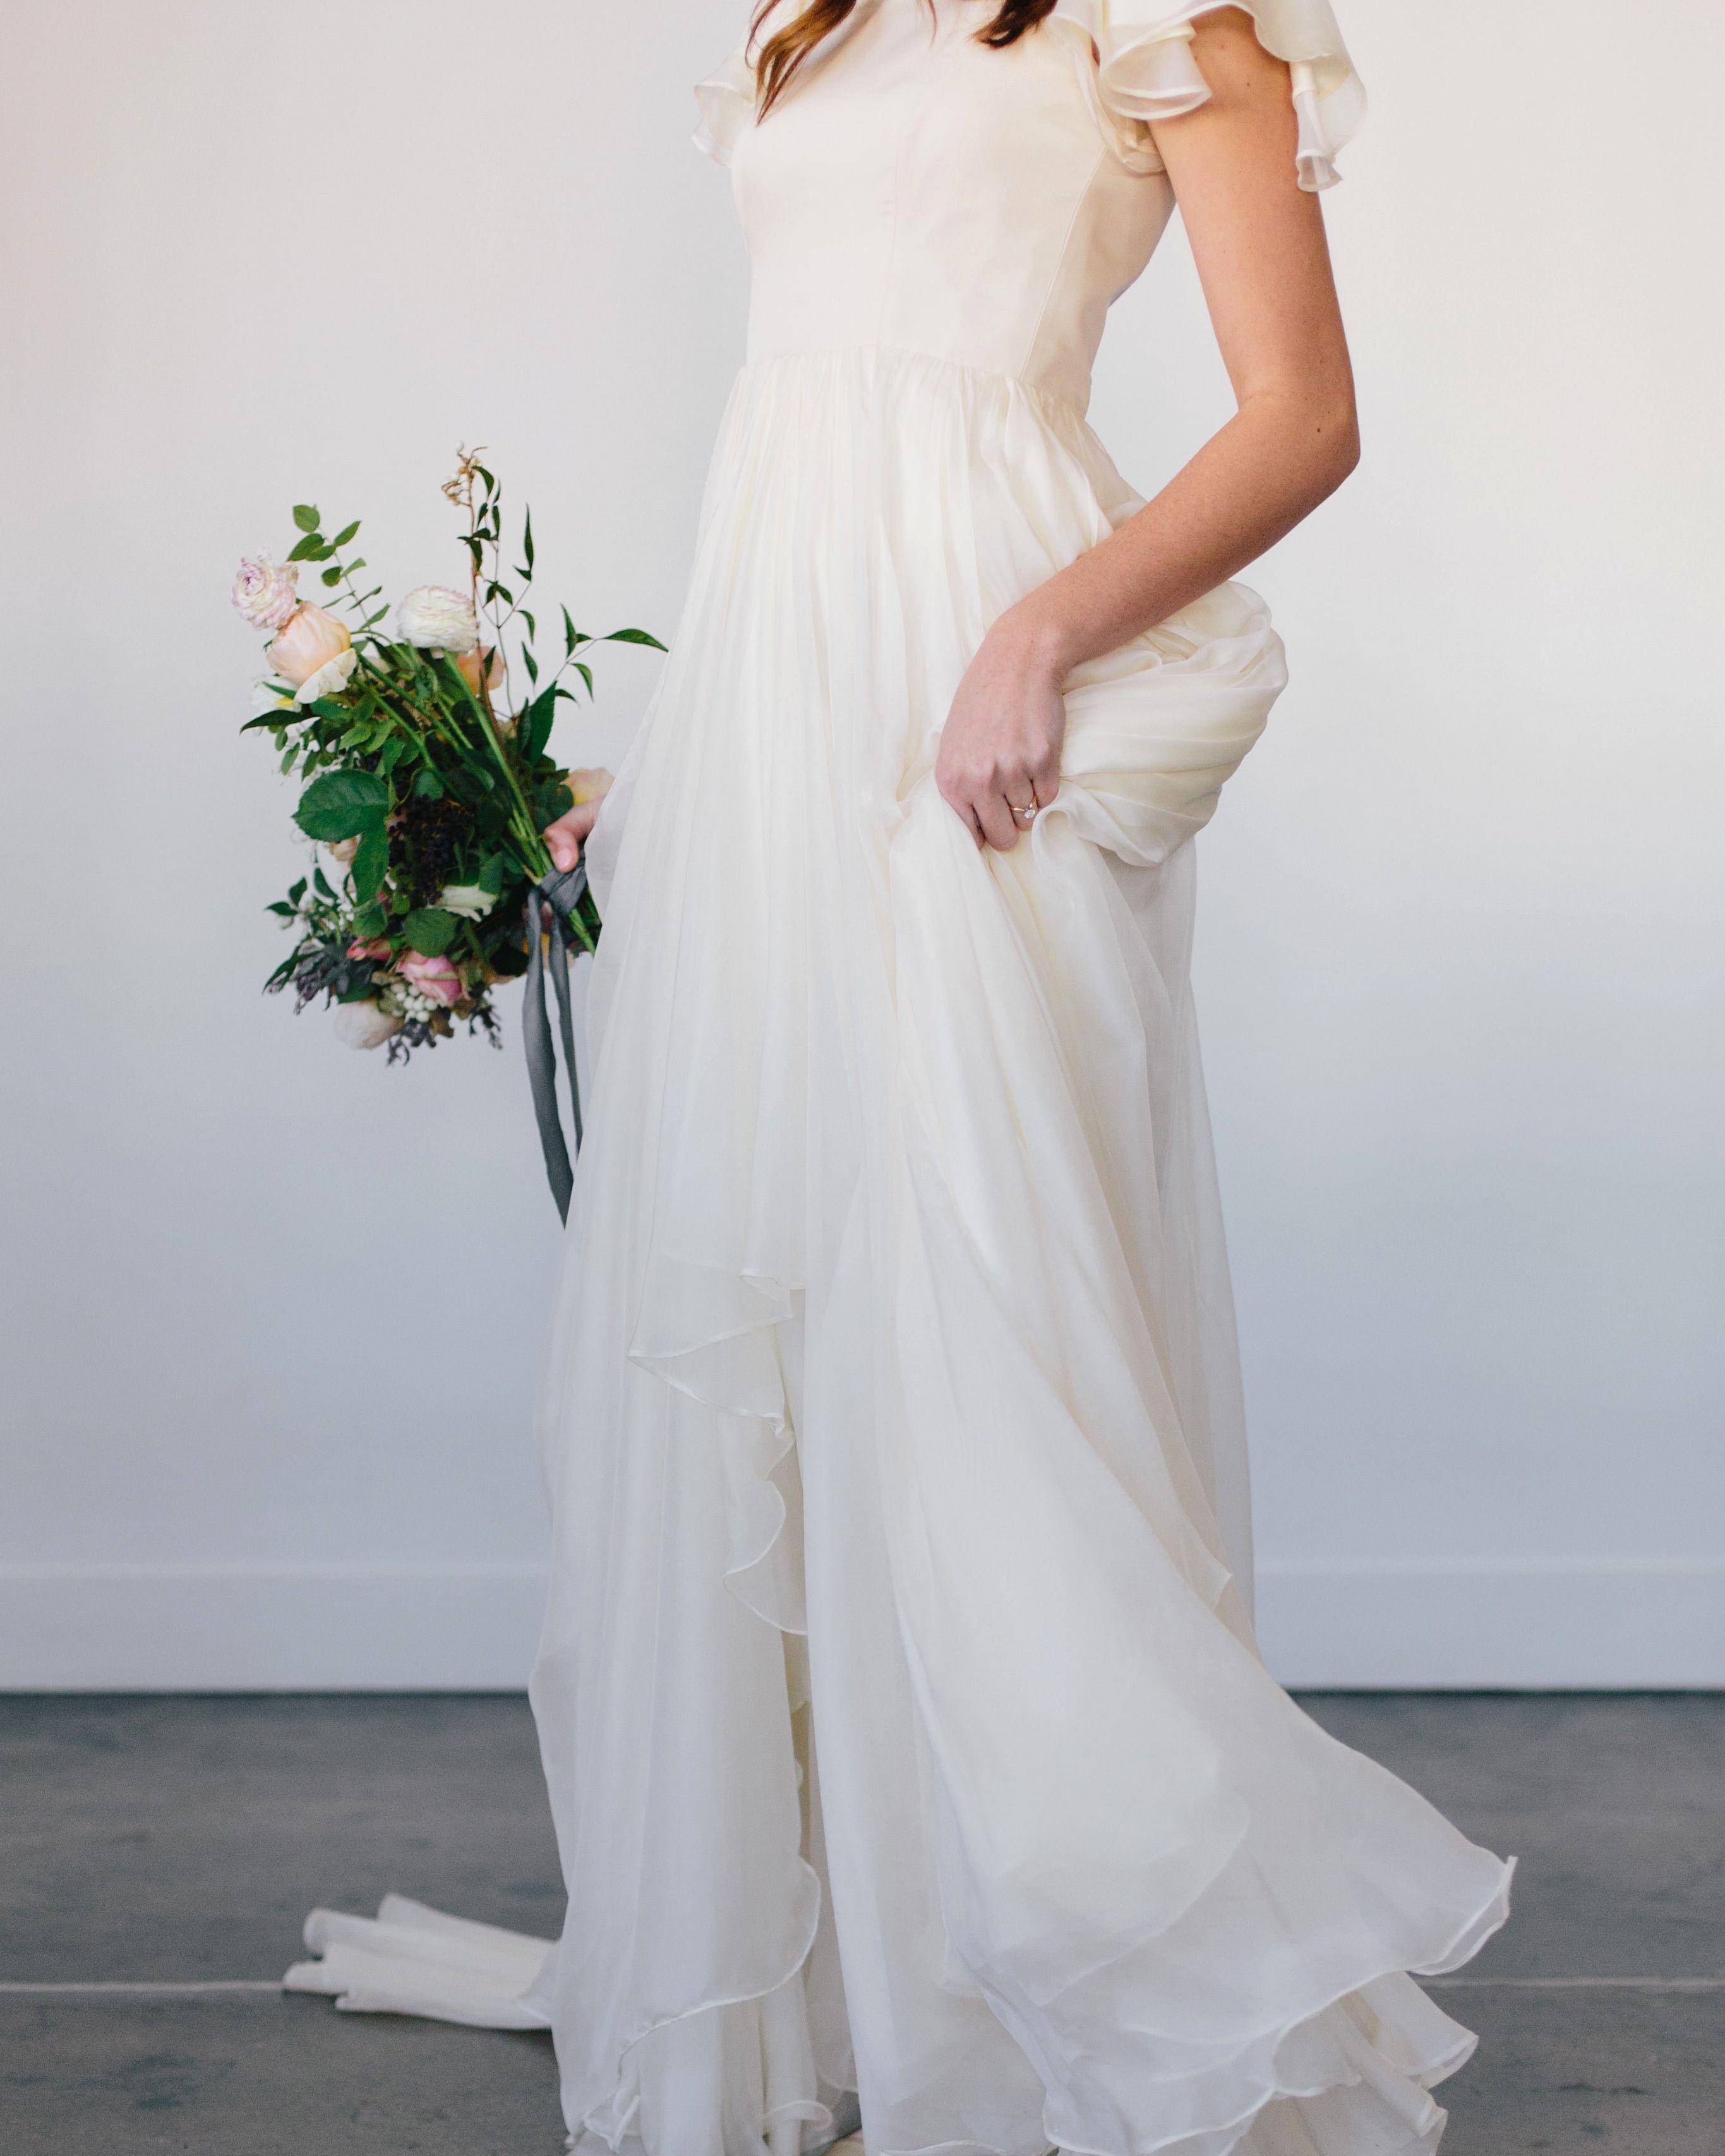 Flowy wedding dress with sleeves  modest wedding dress with flutter sleeves and a flowy skirt from